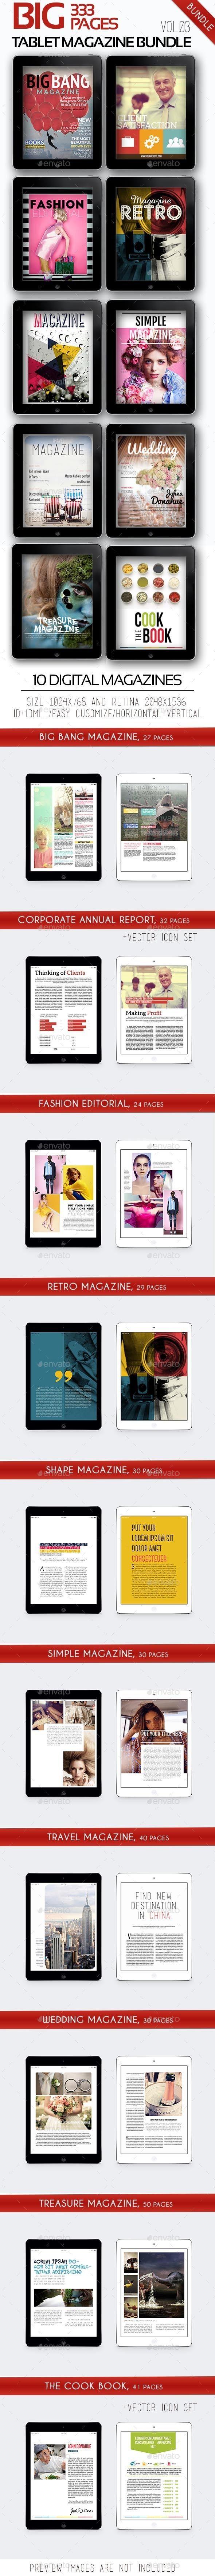 Big iPad &Tablet Magazine Bundle Templates #emagazine #ipadmagazine #ipadjournal Download: http://graphicriver.net/item/big-ipad-tablet-magazine-bundle-vol03/11168993?ref=ksioks